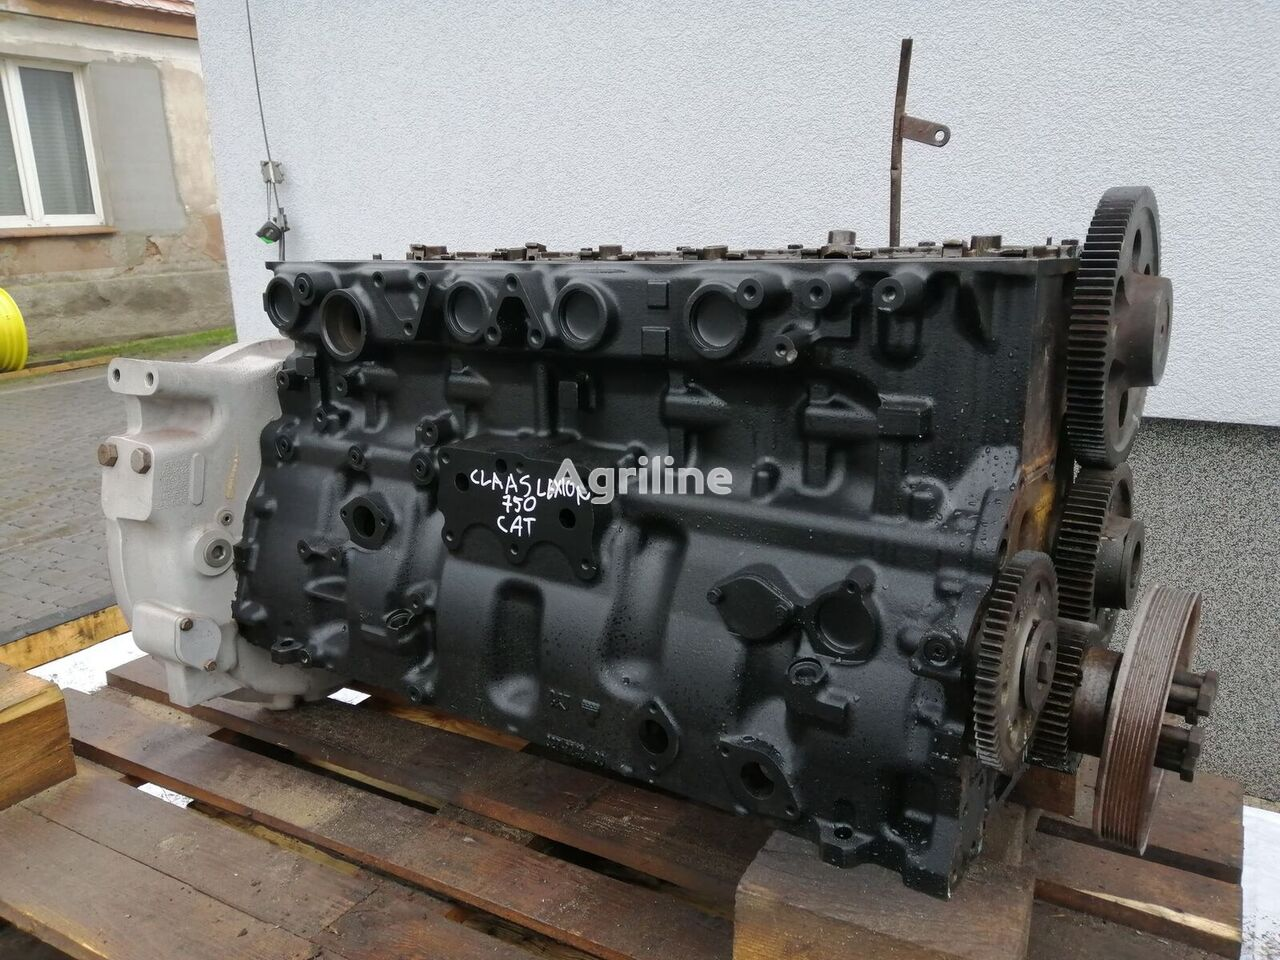 CATERPILLAR C13 engine for CLAAS 750  grain harvester